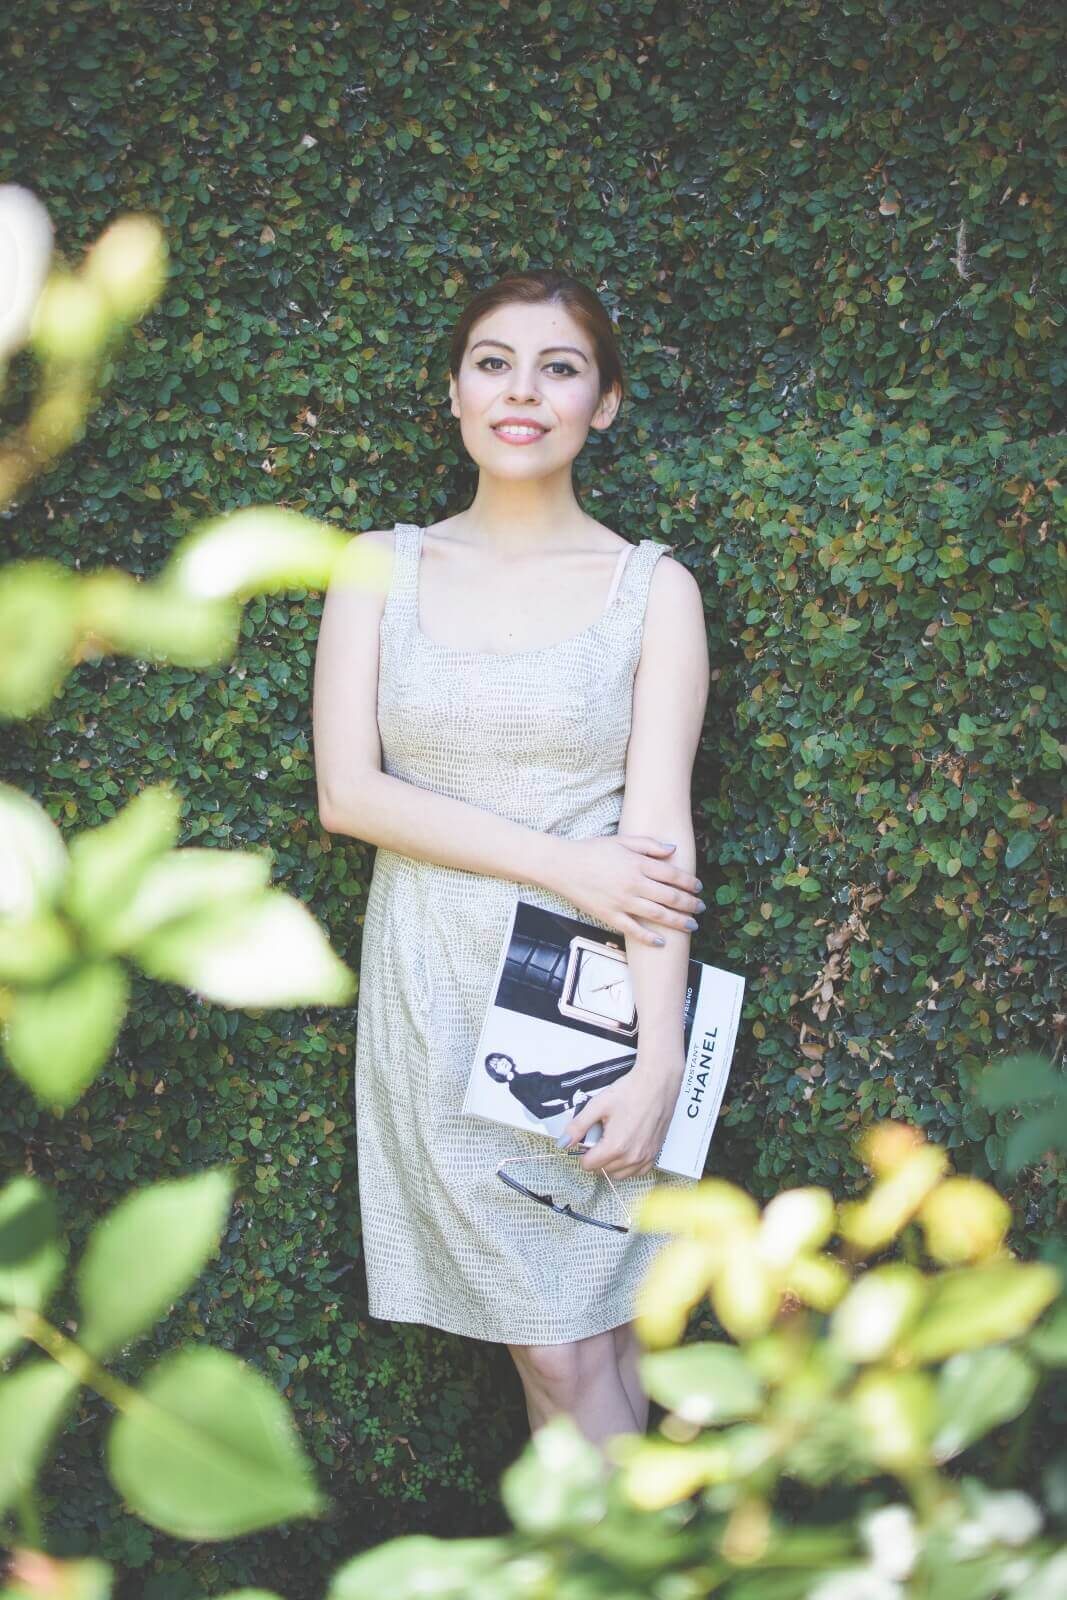 almond-white-dress-sammydress-stilettos-valentino-rockstud-imitation-deborah-ferrero-style-by-deb-ladylike06